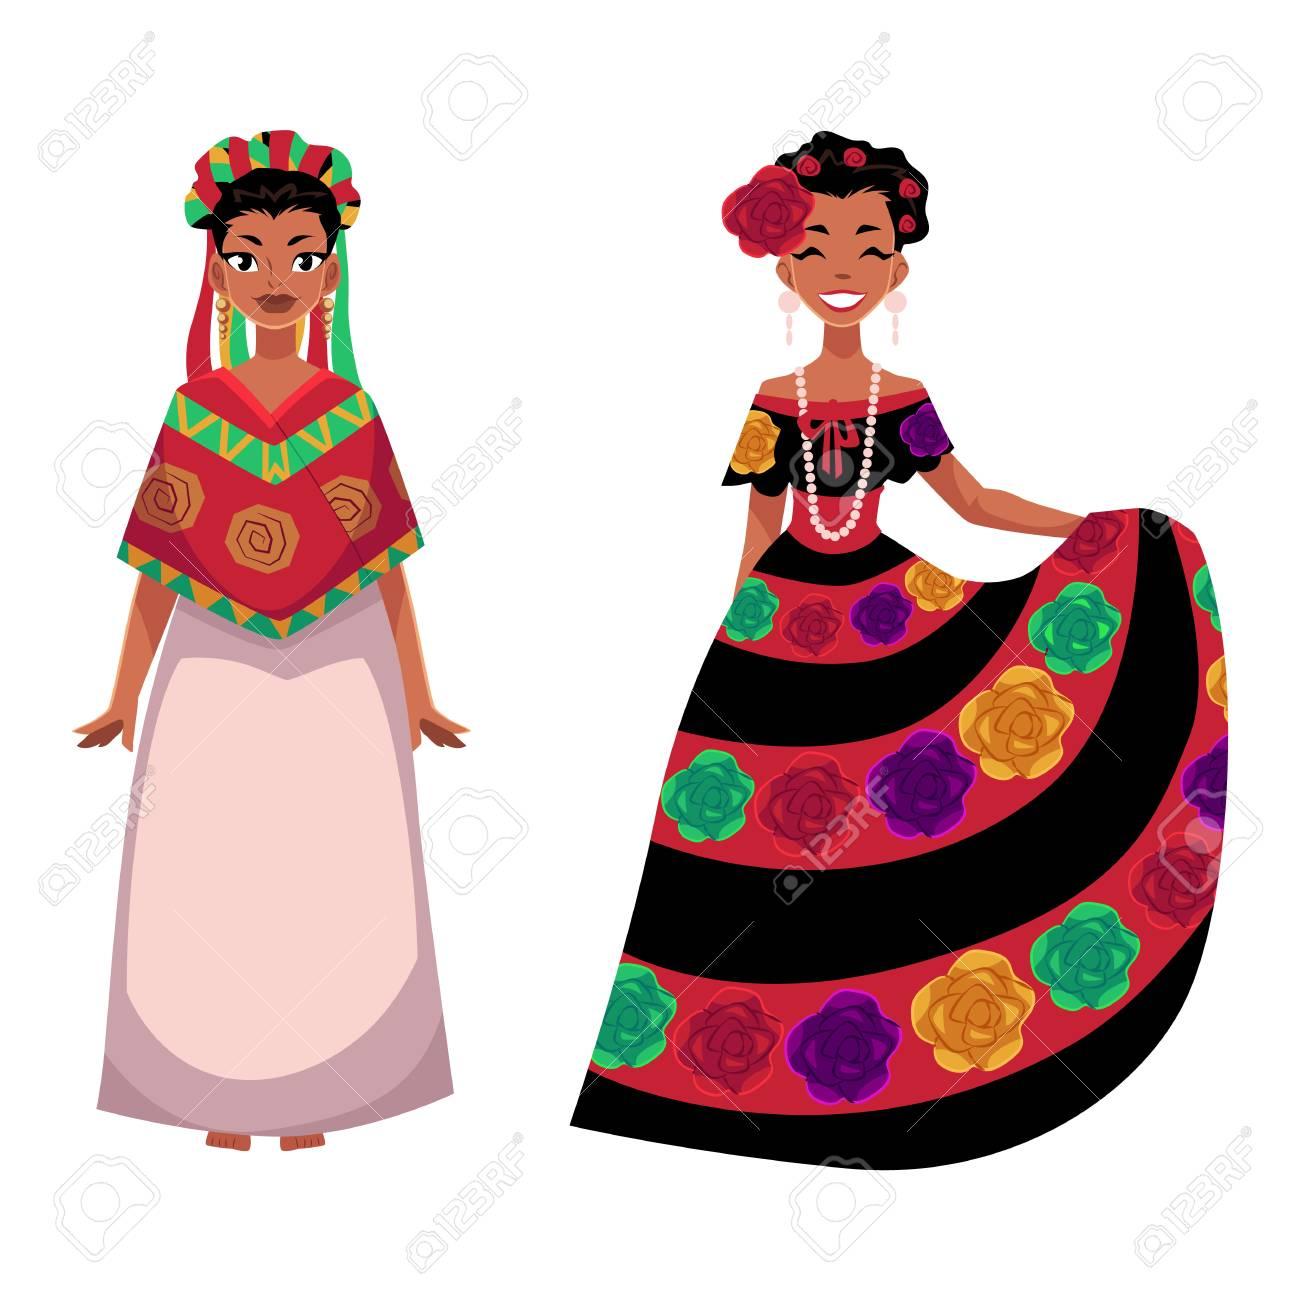 84dce11556 Dos mujer mexicana en traje nacional tradicional decorado con flores  bordadas